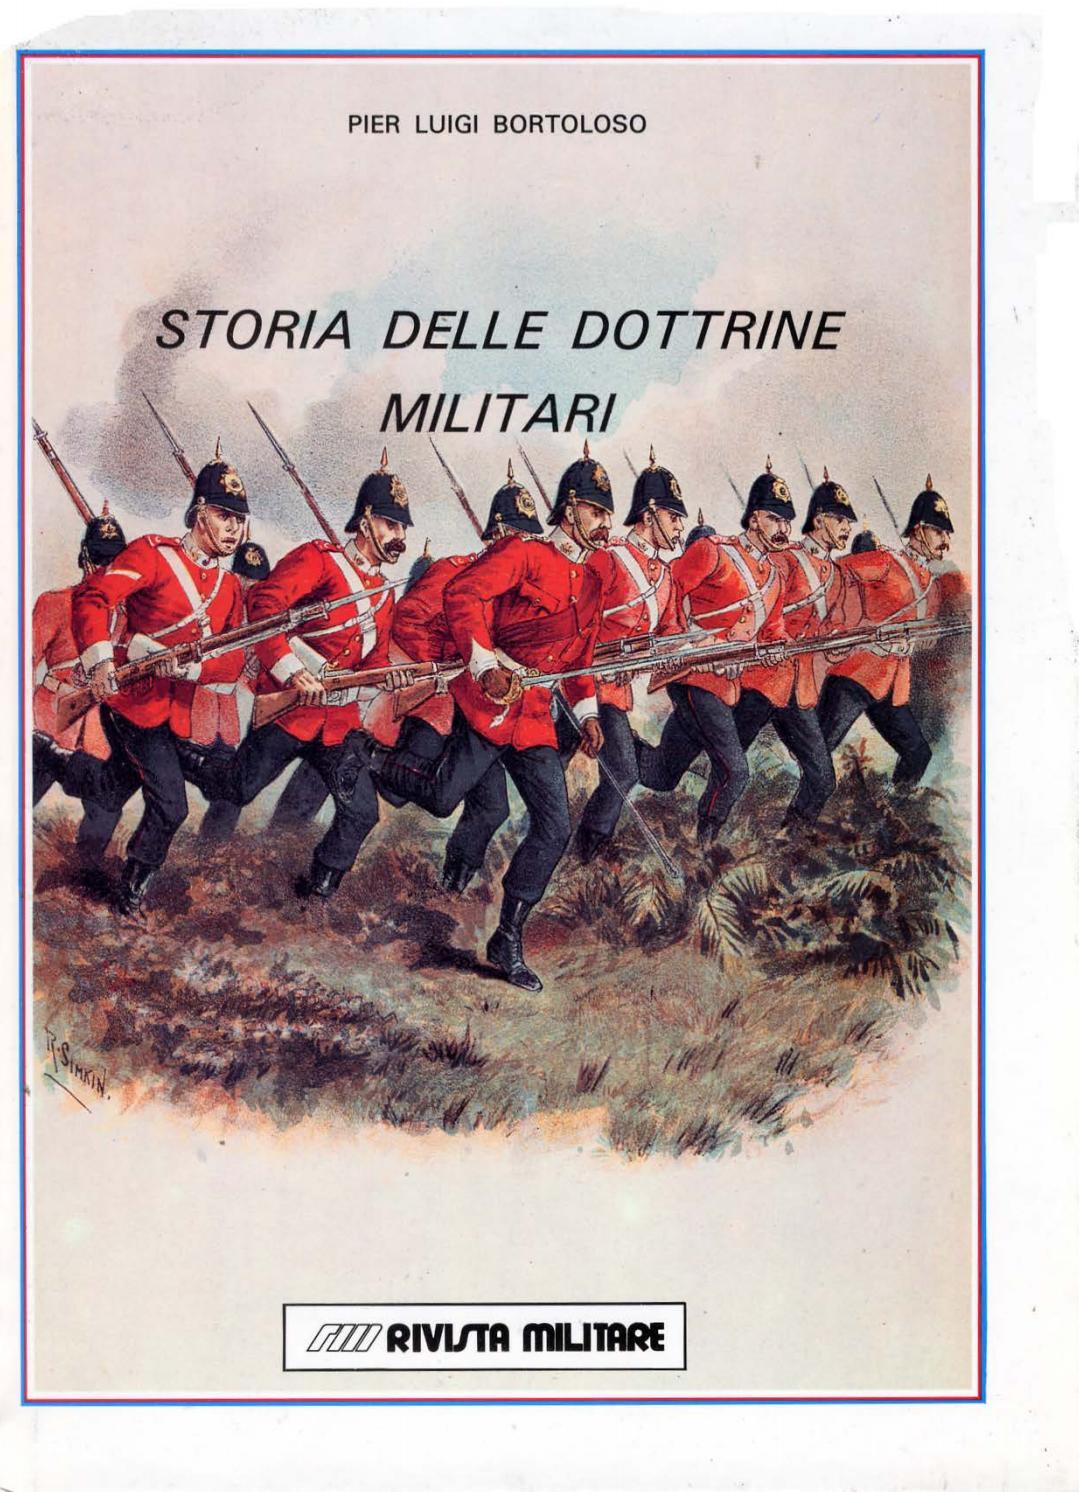 STORIA DELLE DOTTRINE MILITARI by Biblioteca Militare - issuu 4f9353b7ebca